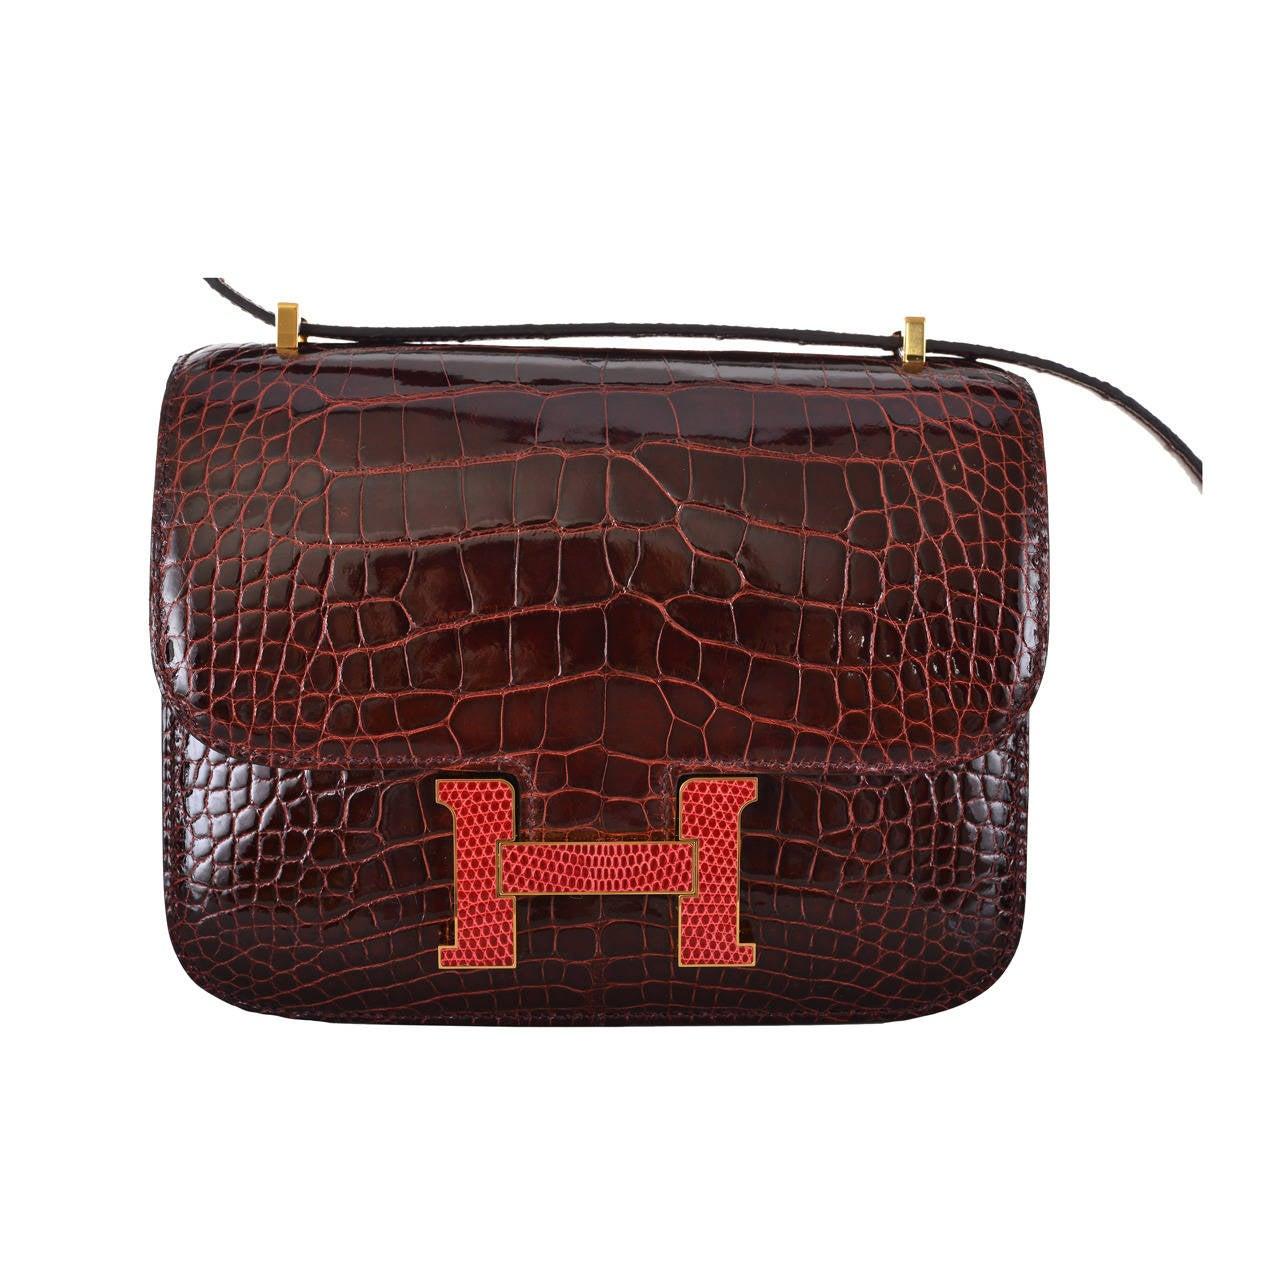 c38bff2c3cc6 ireland hermes constance crocodile bag price 86076 f99cc